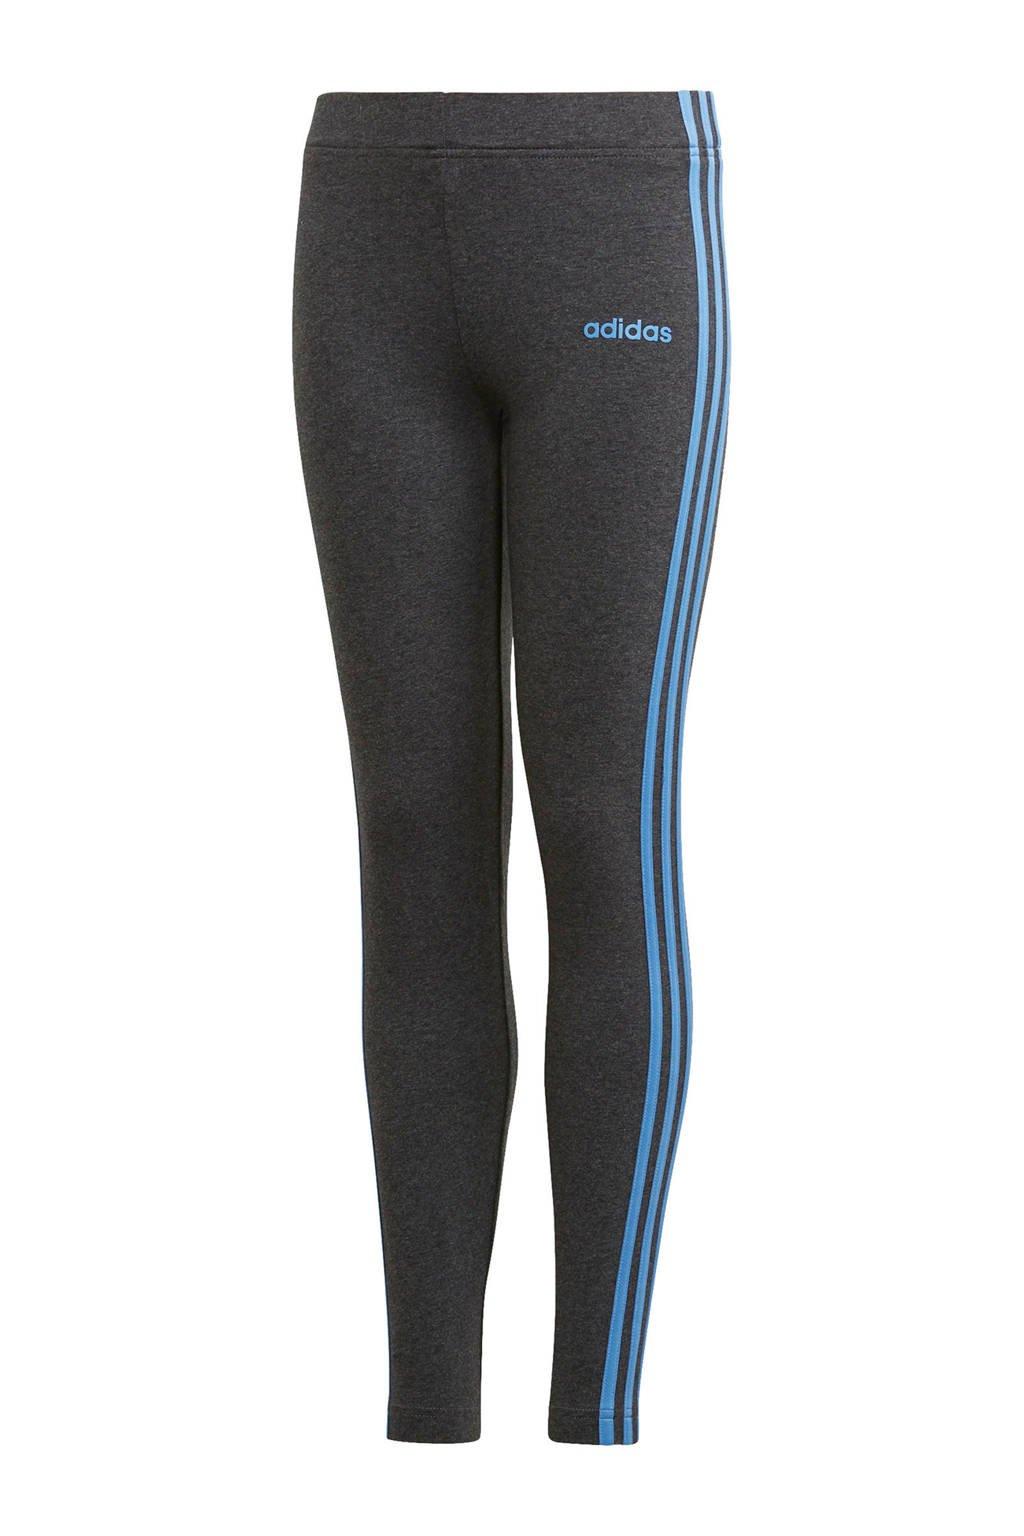 adidas performance sportbroek antraciet, Antraciet/blauw